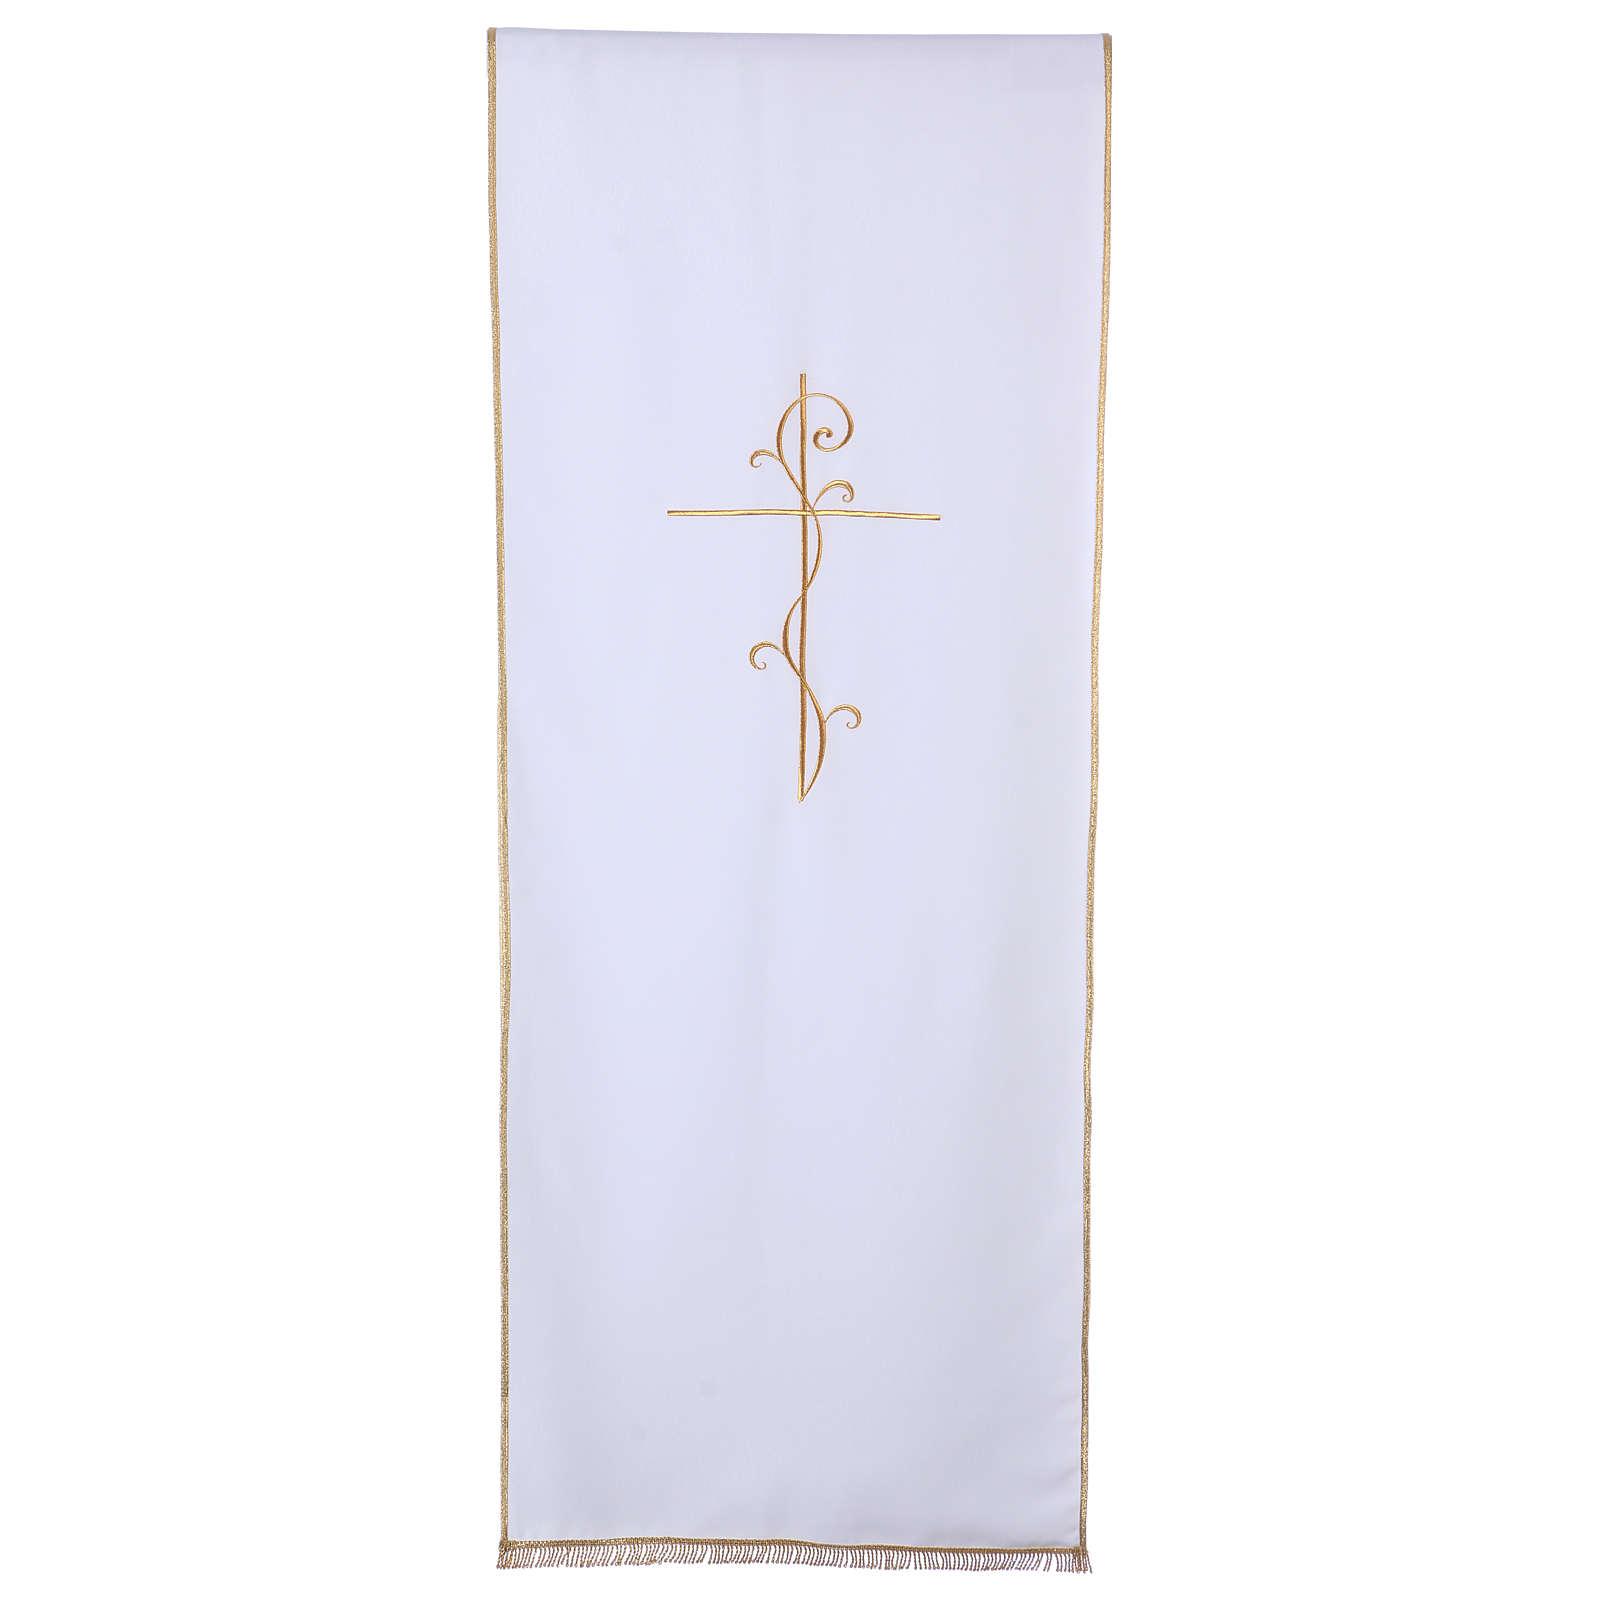 Cubre Atril tejido Vatican poliéster bordado cruz 4